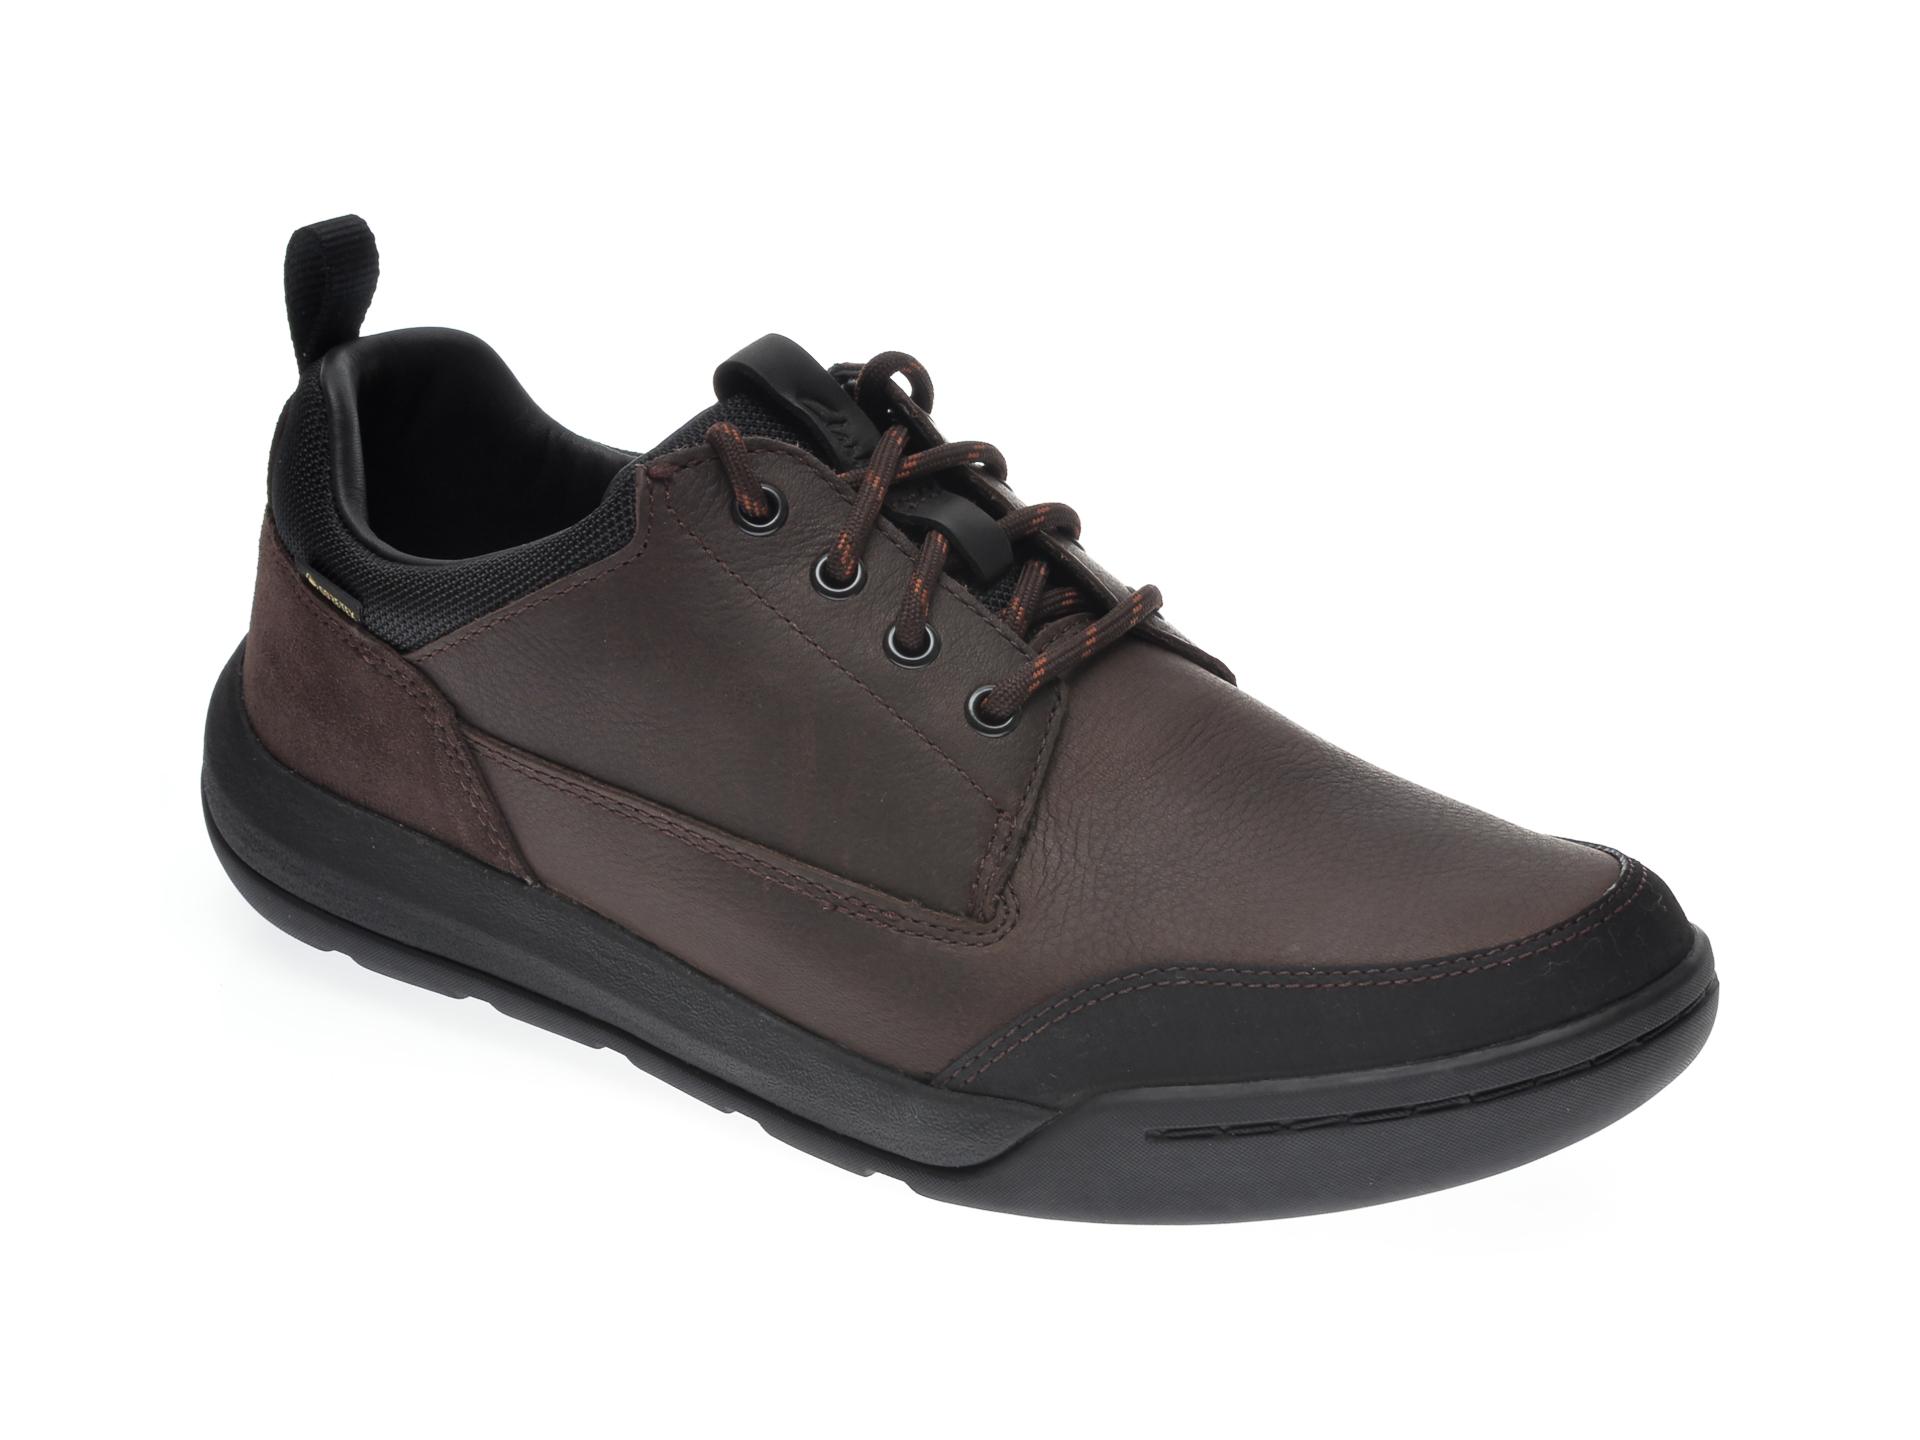 Pantofi CLARKS maro, ASHCOMBE LO GTX, din piele naturala imagine